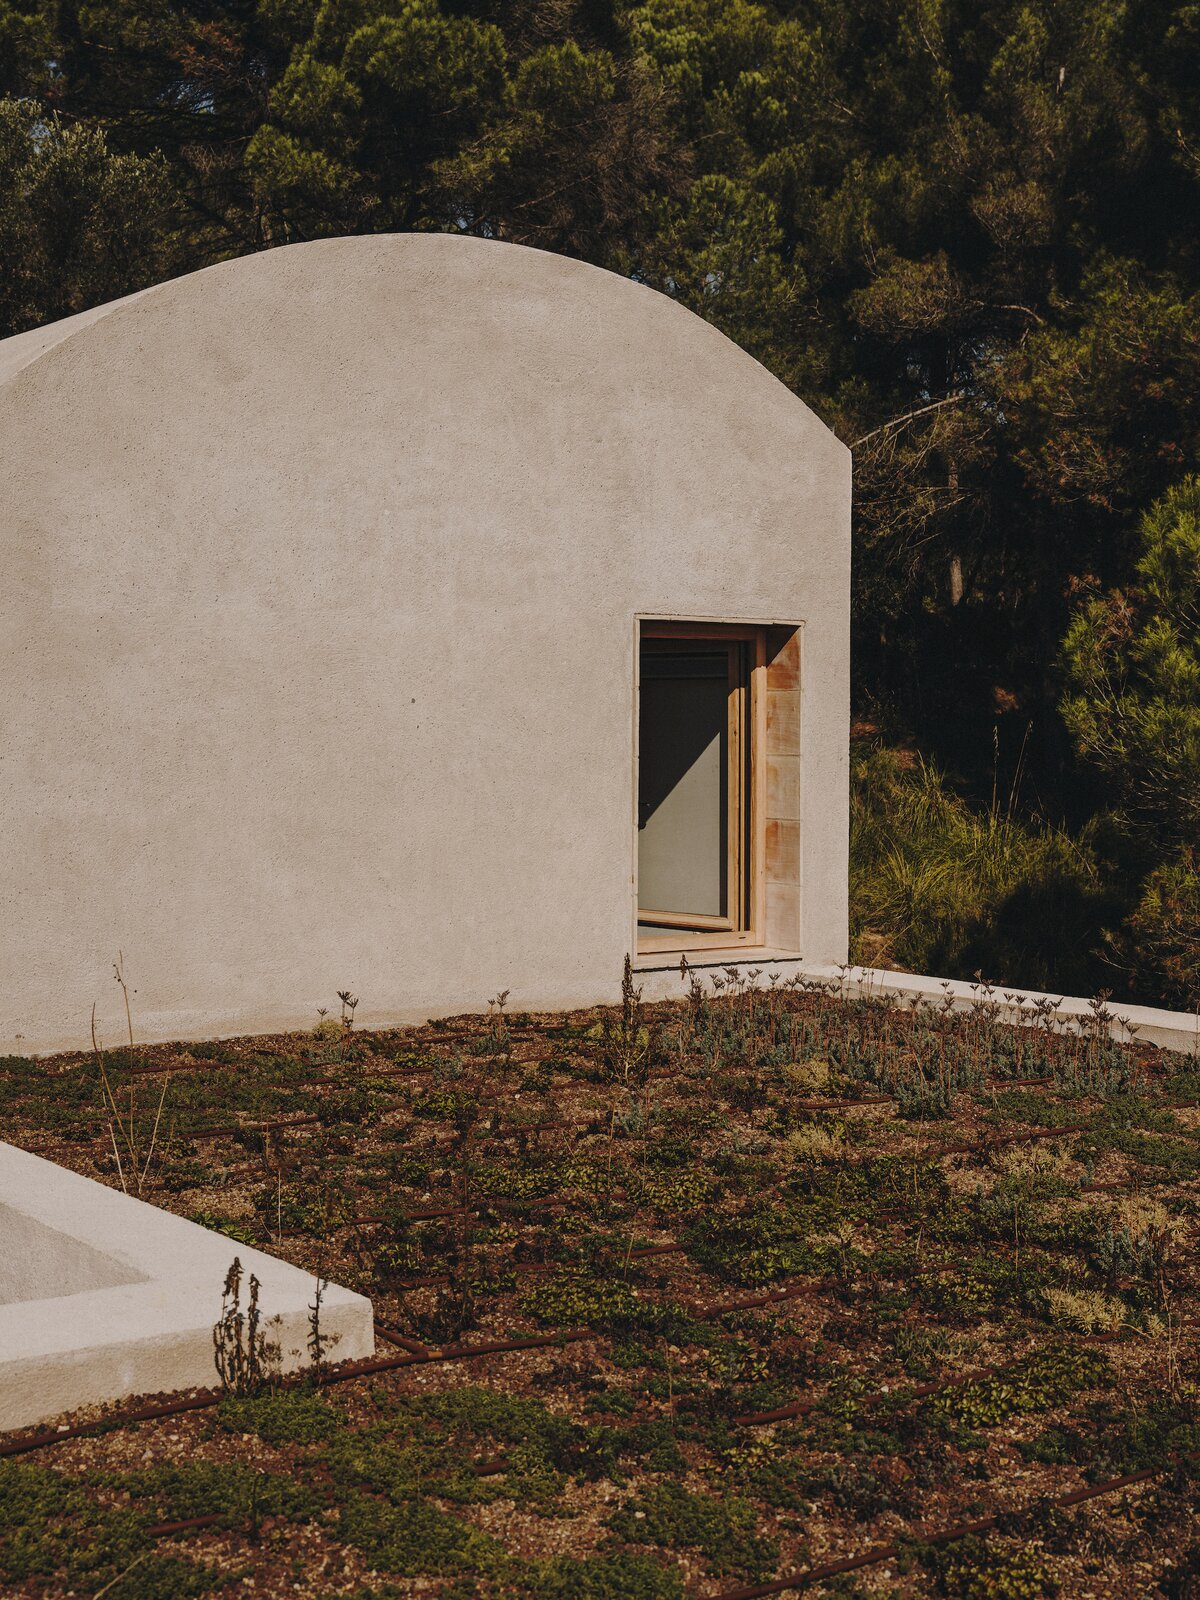 Roof garden of Casa Ter by Mesura.